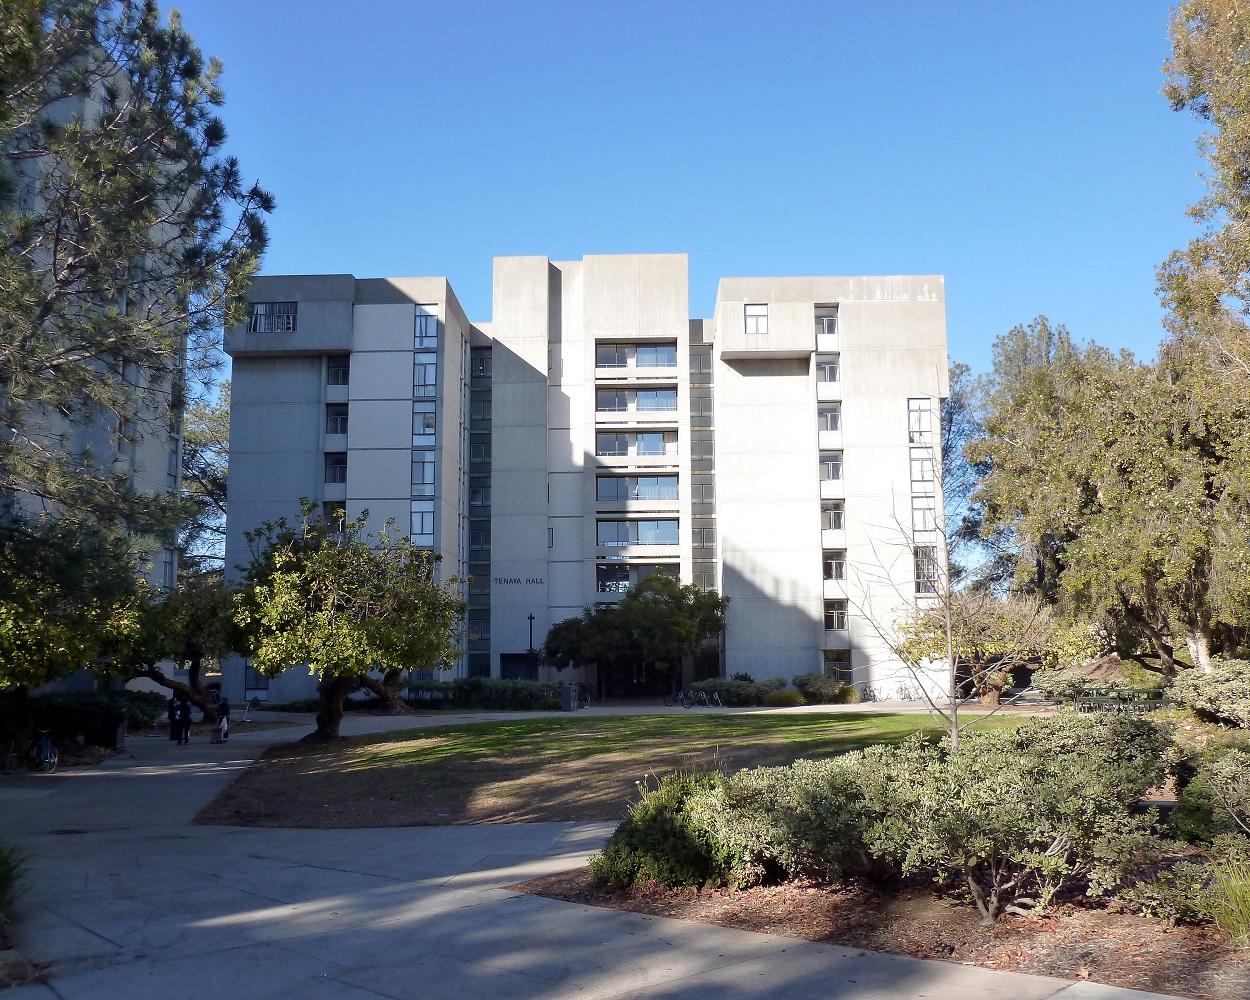 Tenaya Hall